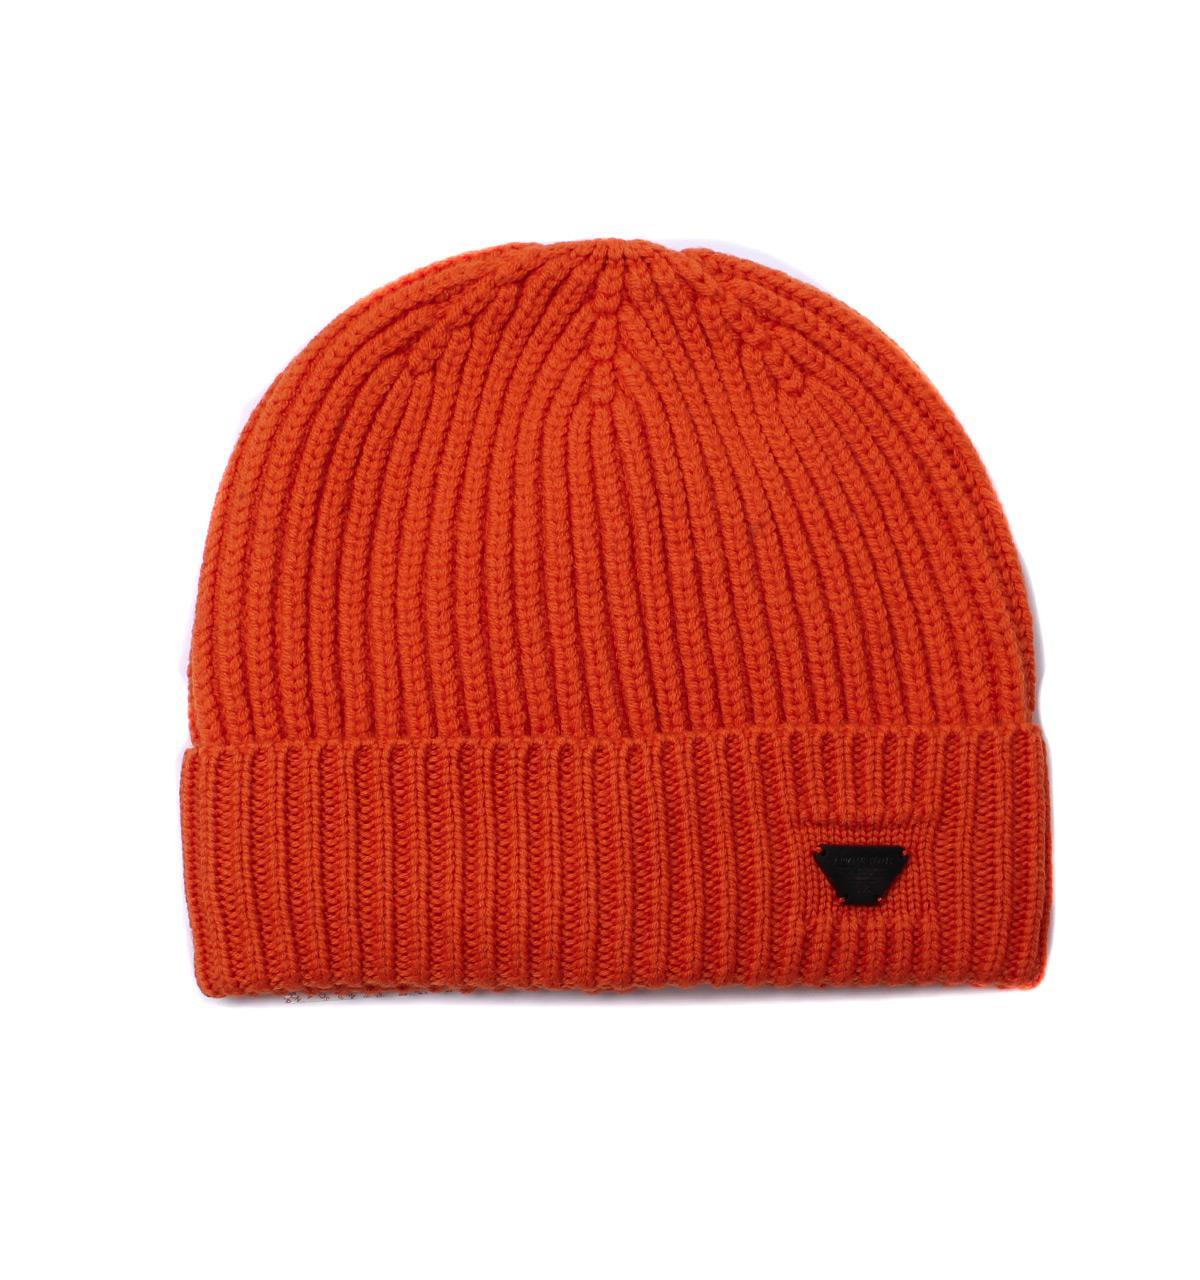 a0e5a168dec Armani Jeans Orange Woollen Rib Knit Beanie Hat in Orange for Men ...